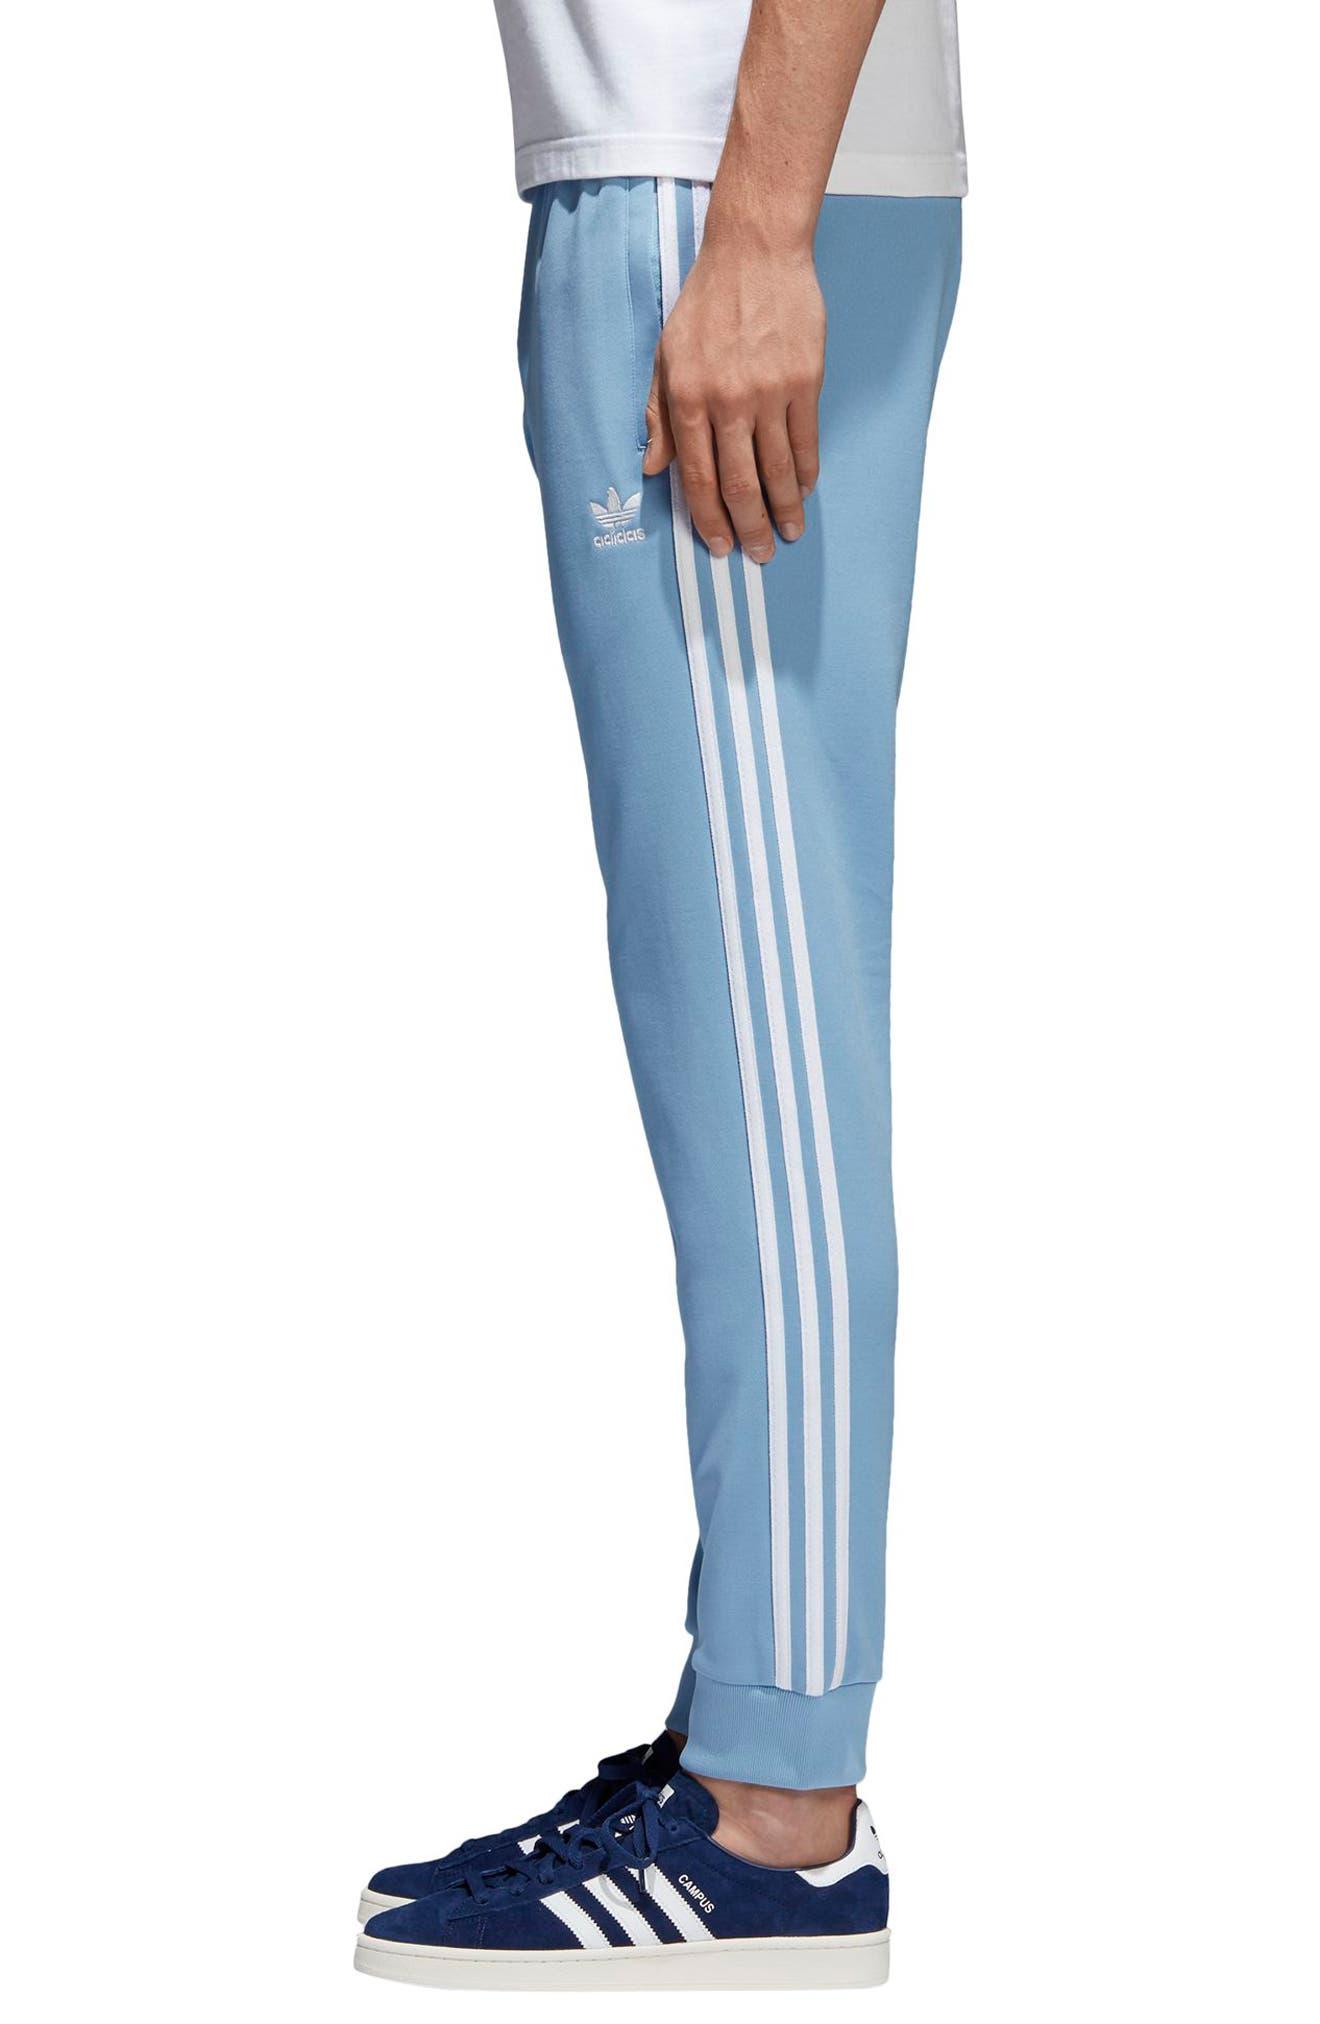 SST Track Pants,                             Alternate thumbnail 3, color,                             459